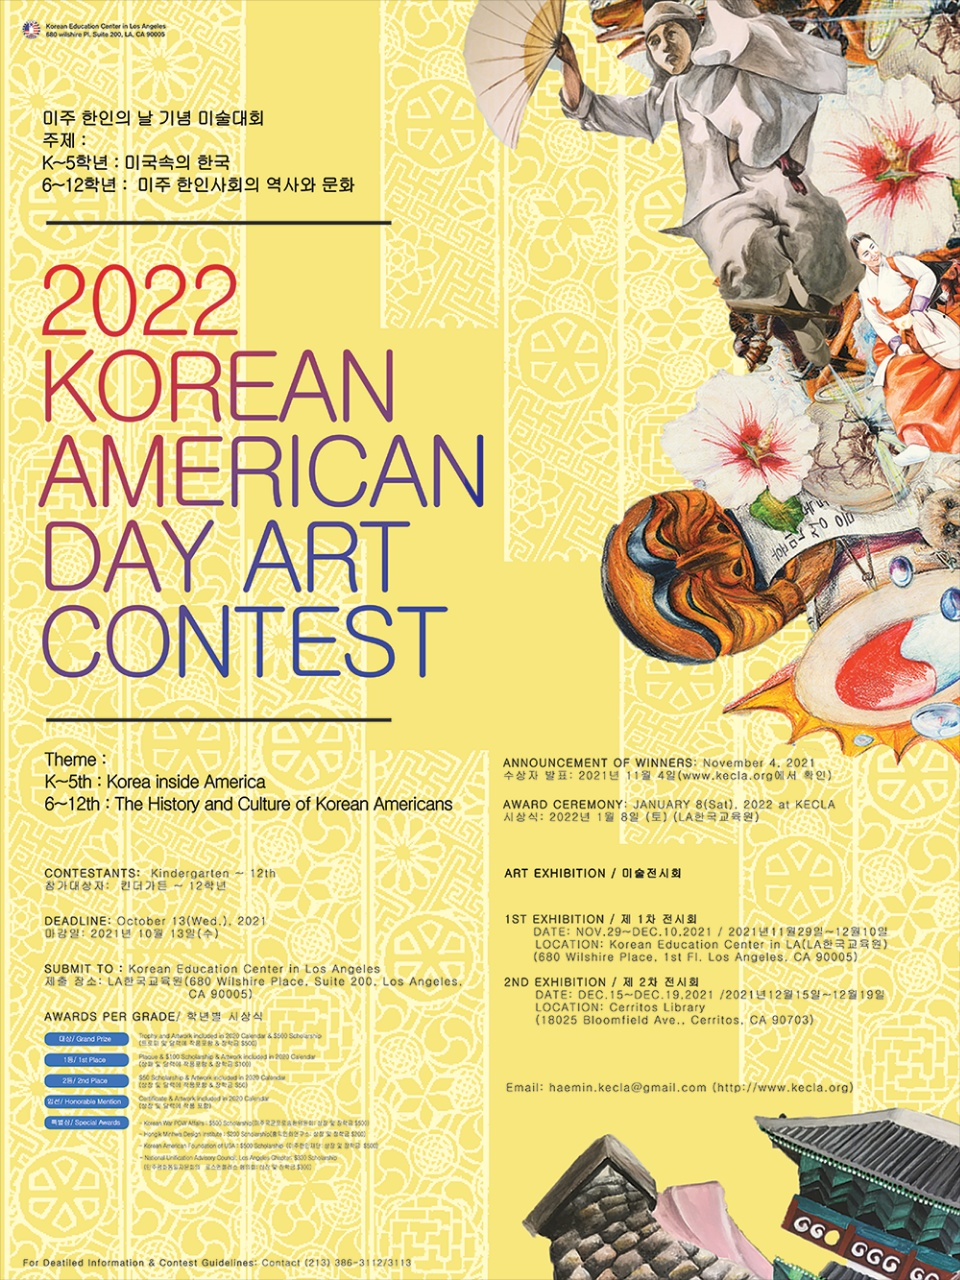 2022 Korean American Day Art Contest.jpg